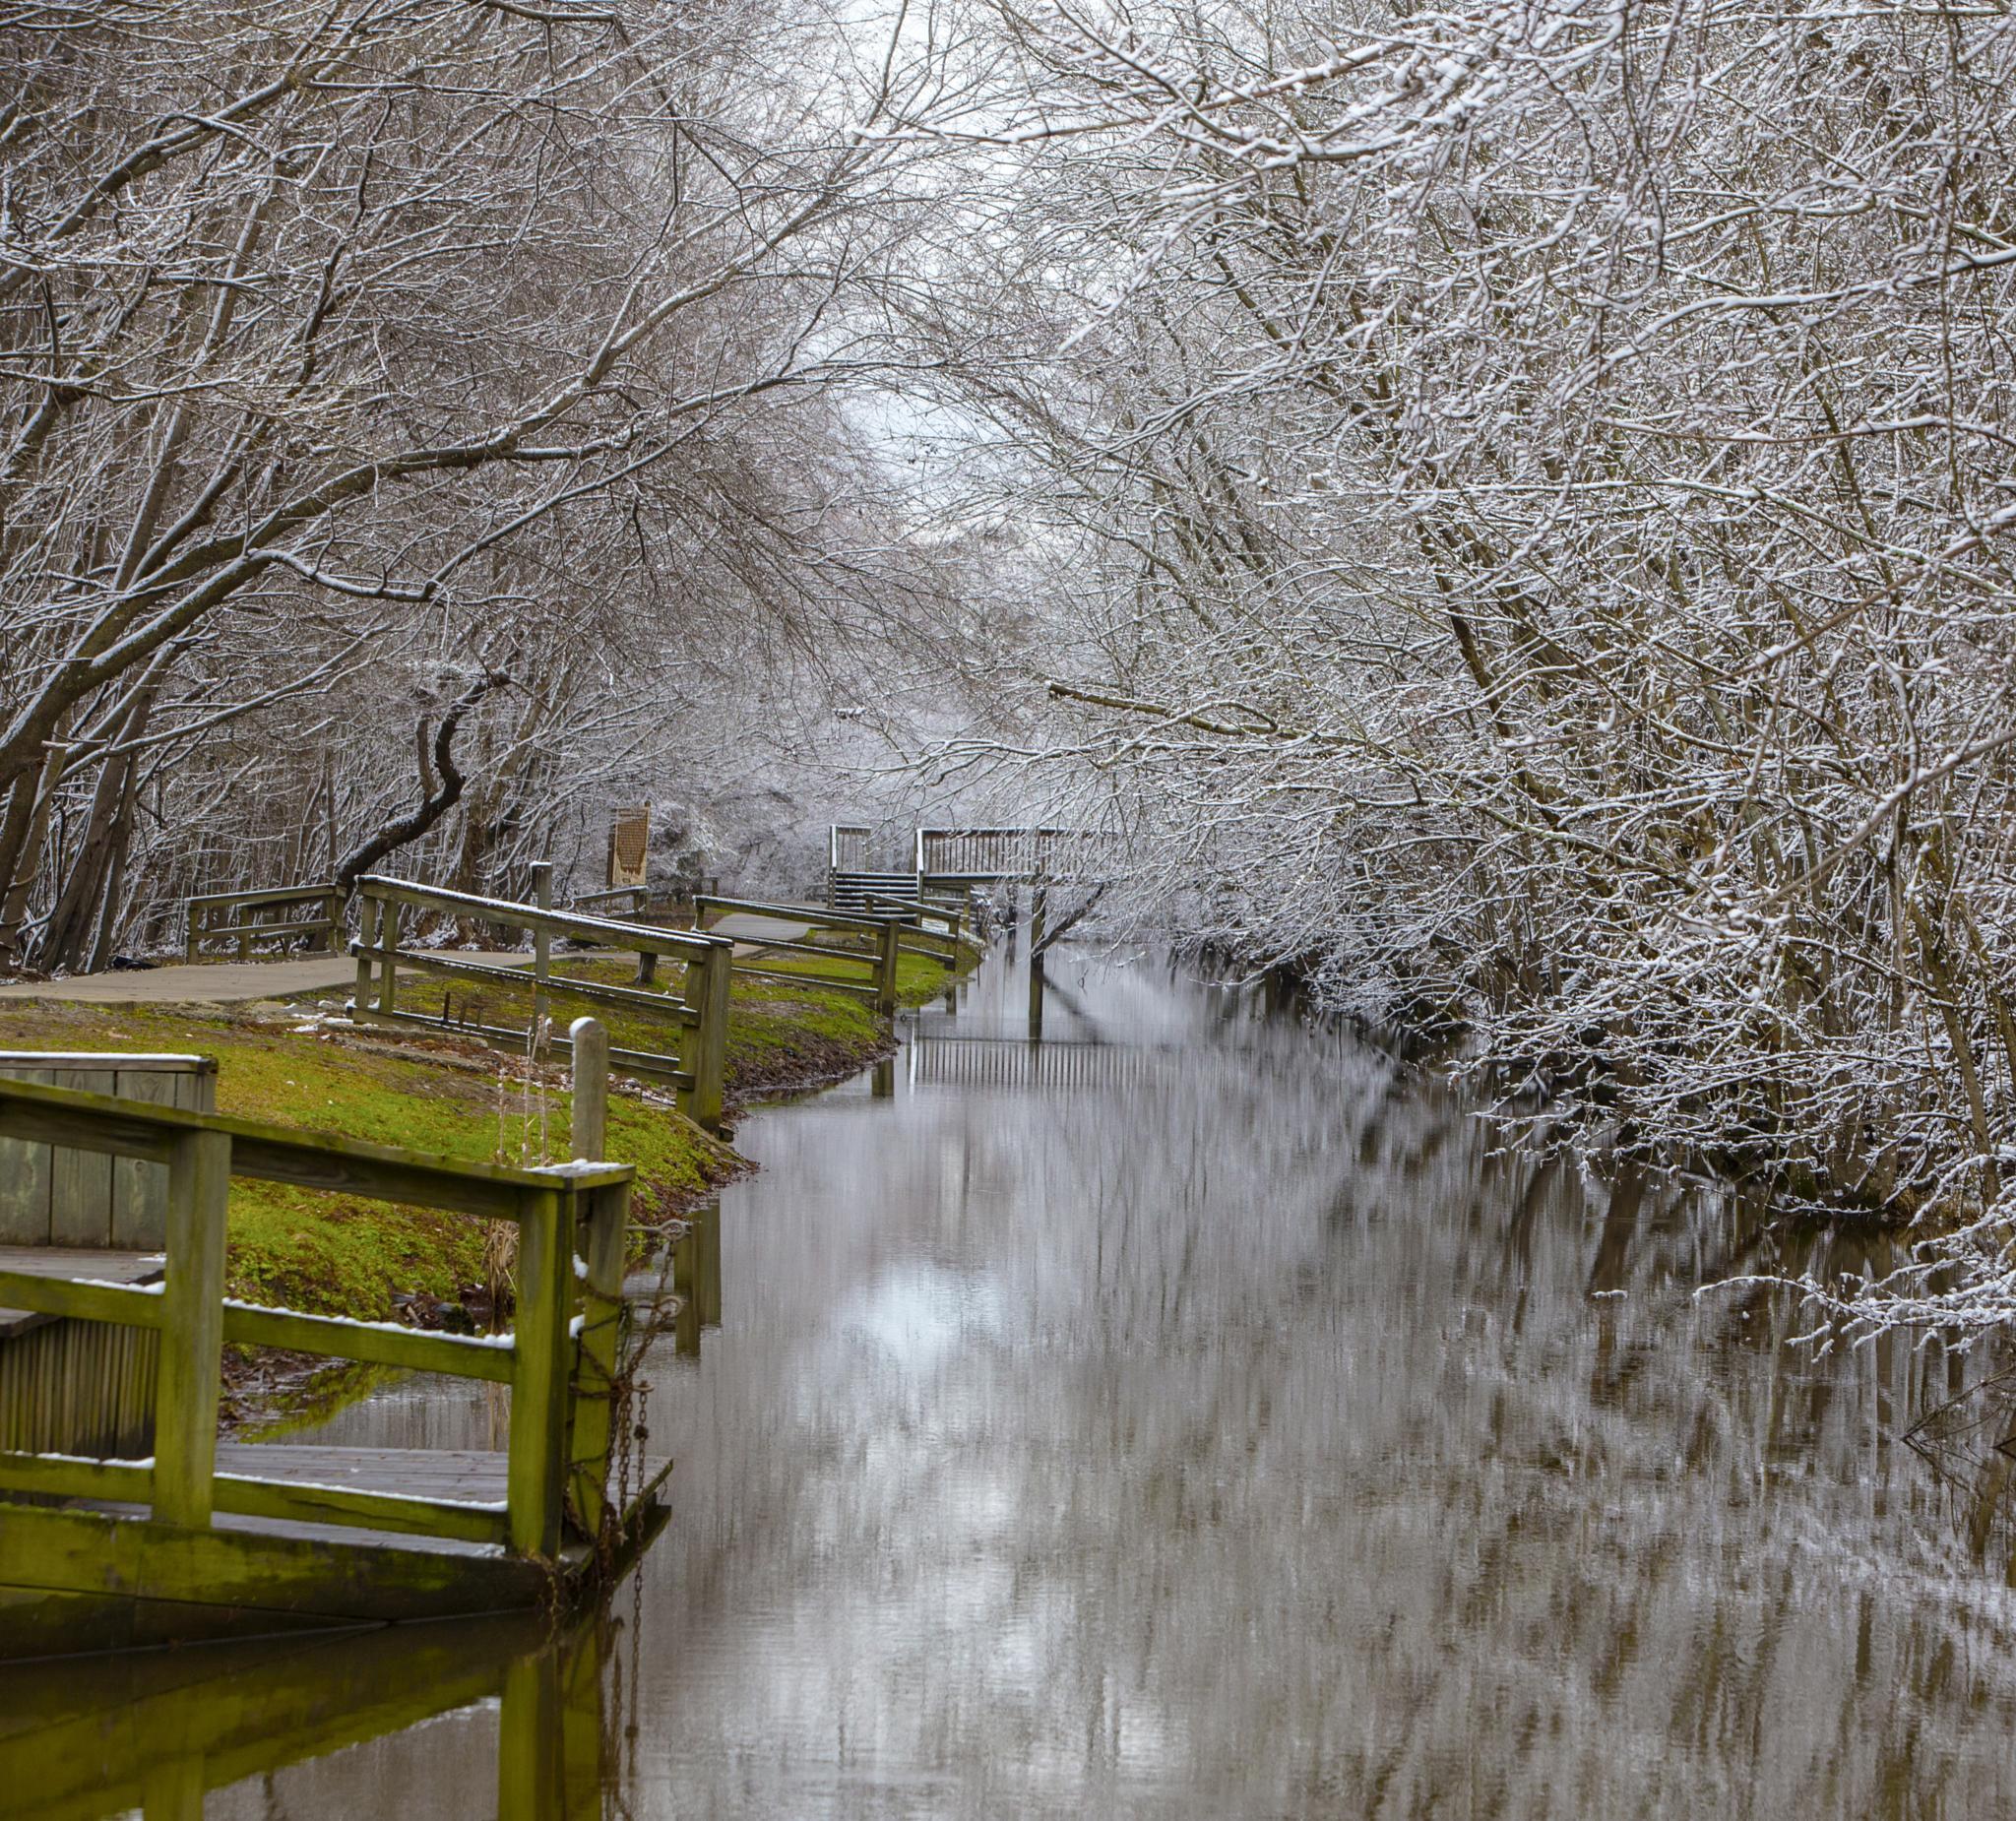 Cashie River in Snow by askdrferguson